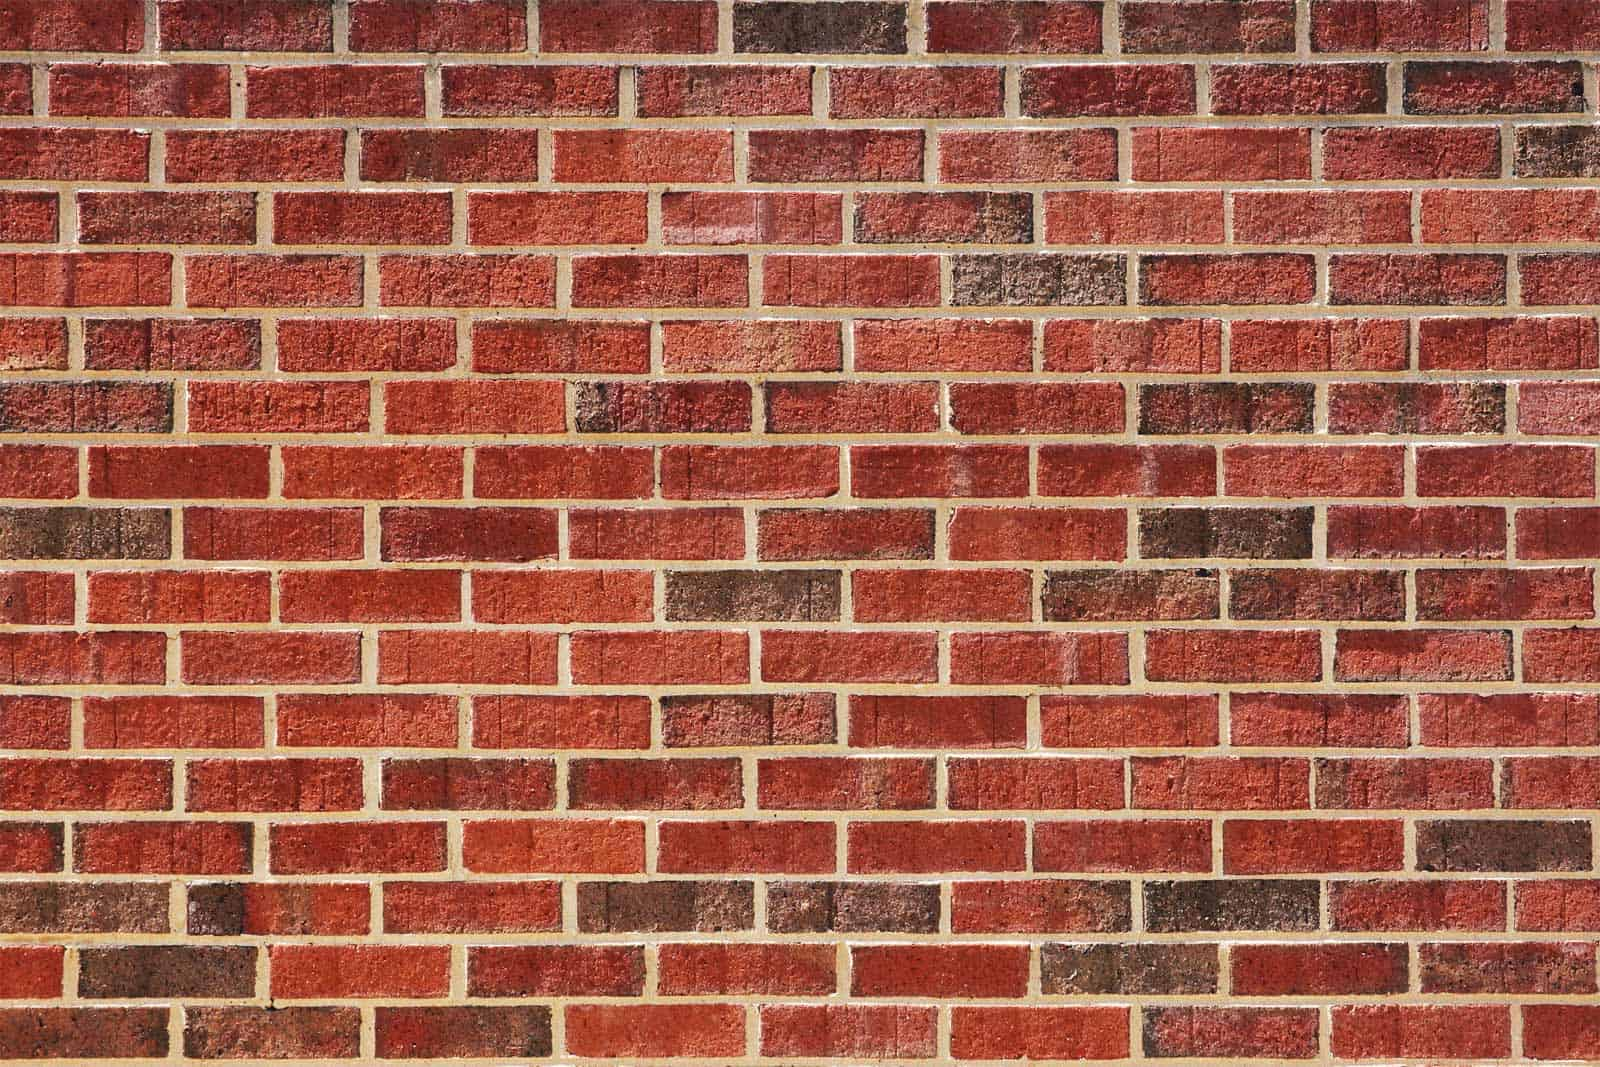 Great Wall Of Tiles Ideas - The Best Bathroom Ideas - lapoup.com